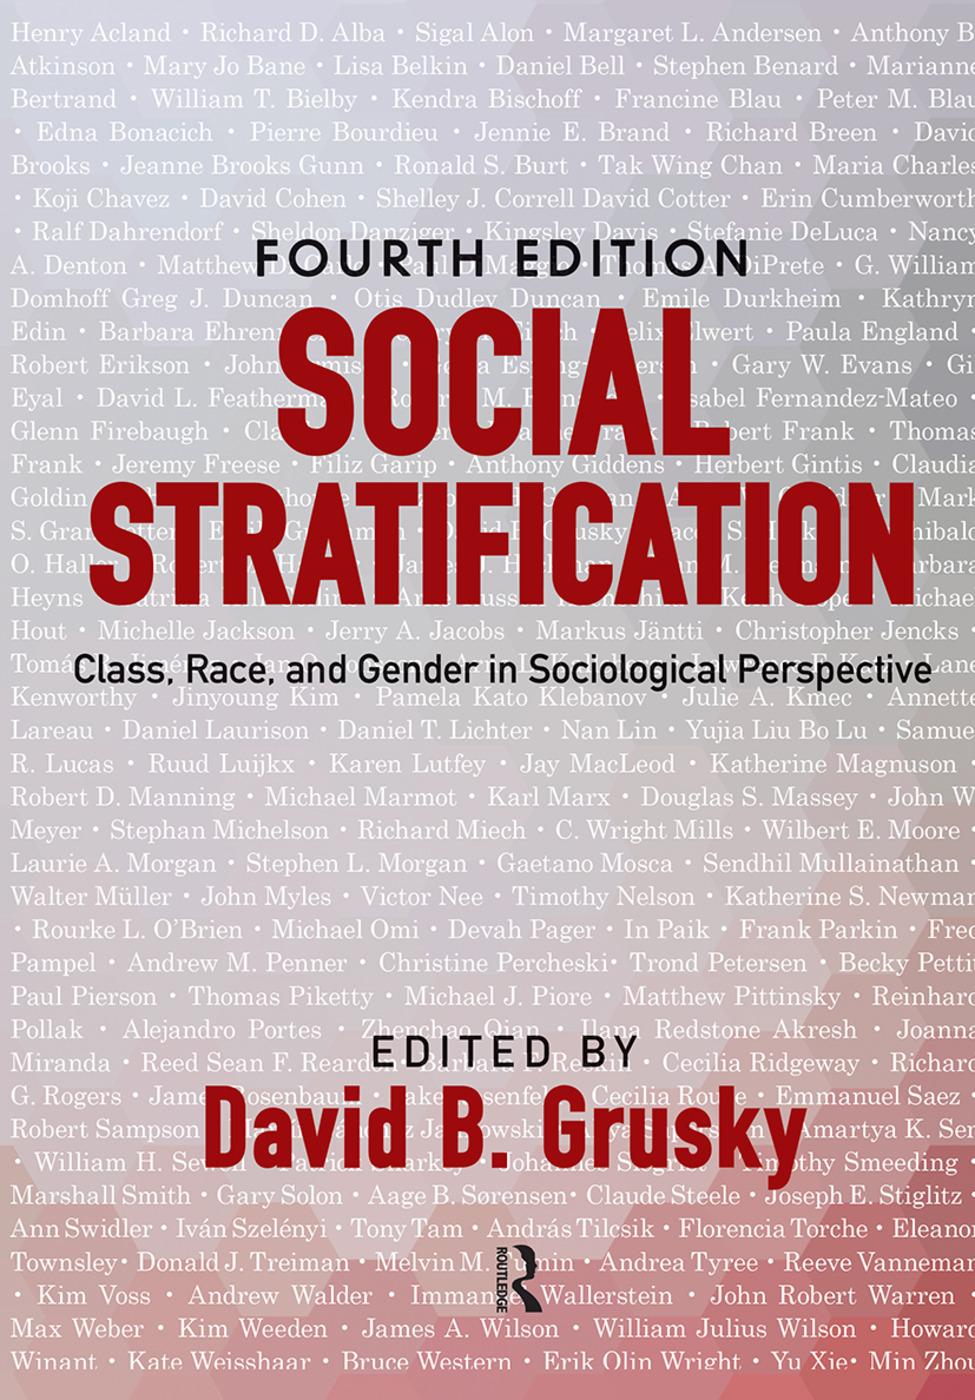 Social Stratification Racial Stratification